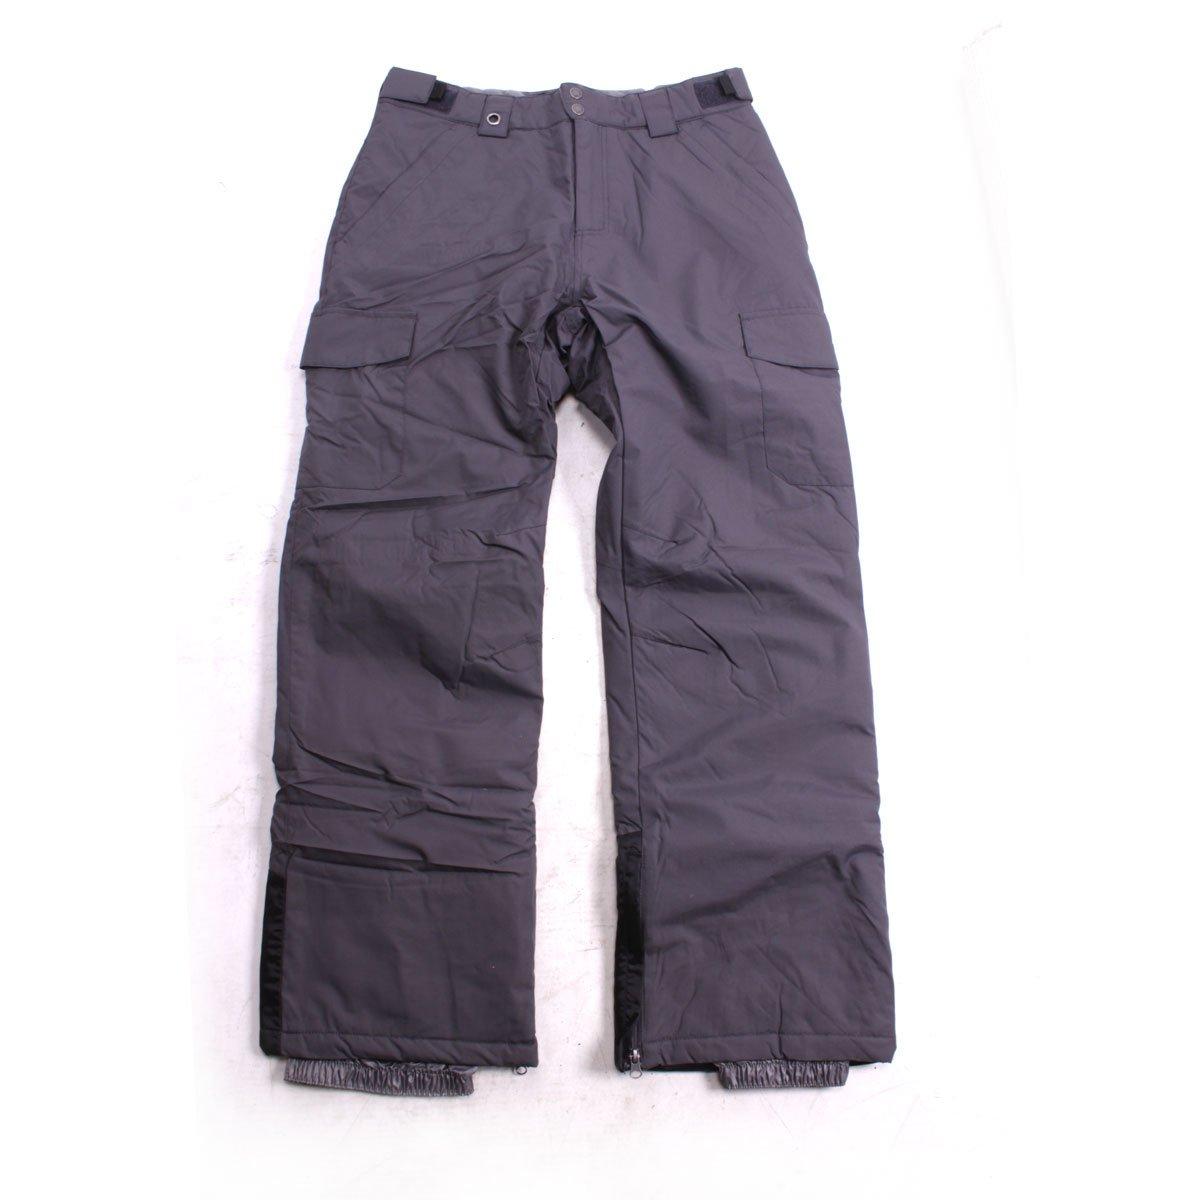 White Sierra Zephyr Insulated Ski Pants 32'' Inseam Asphalt Medium